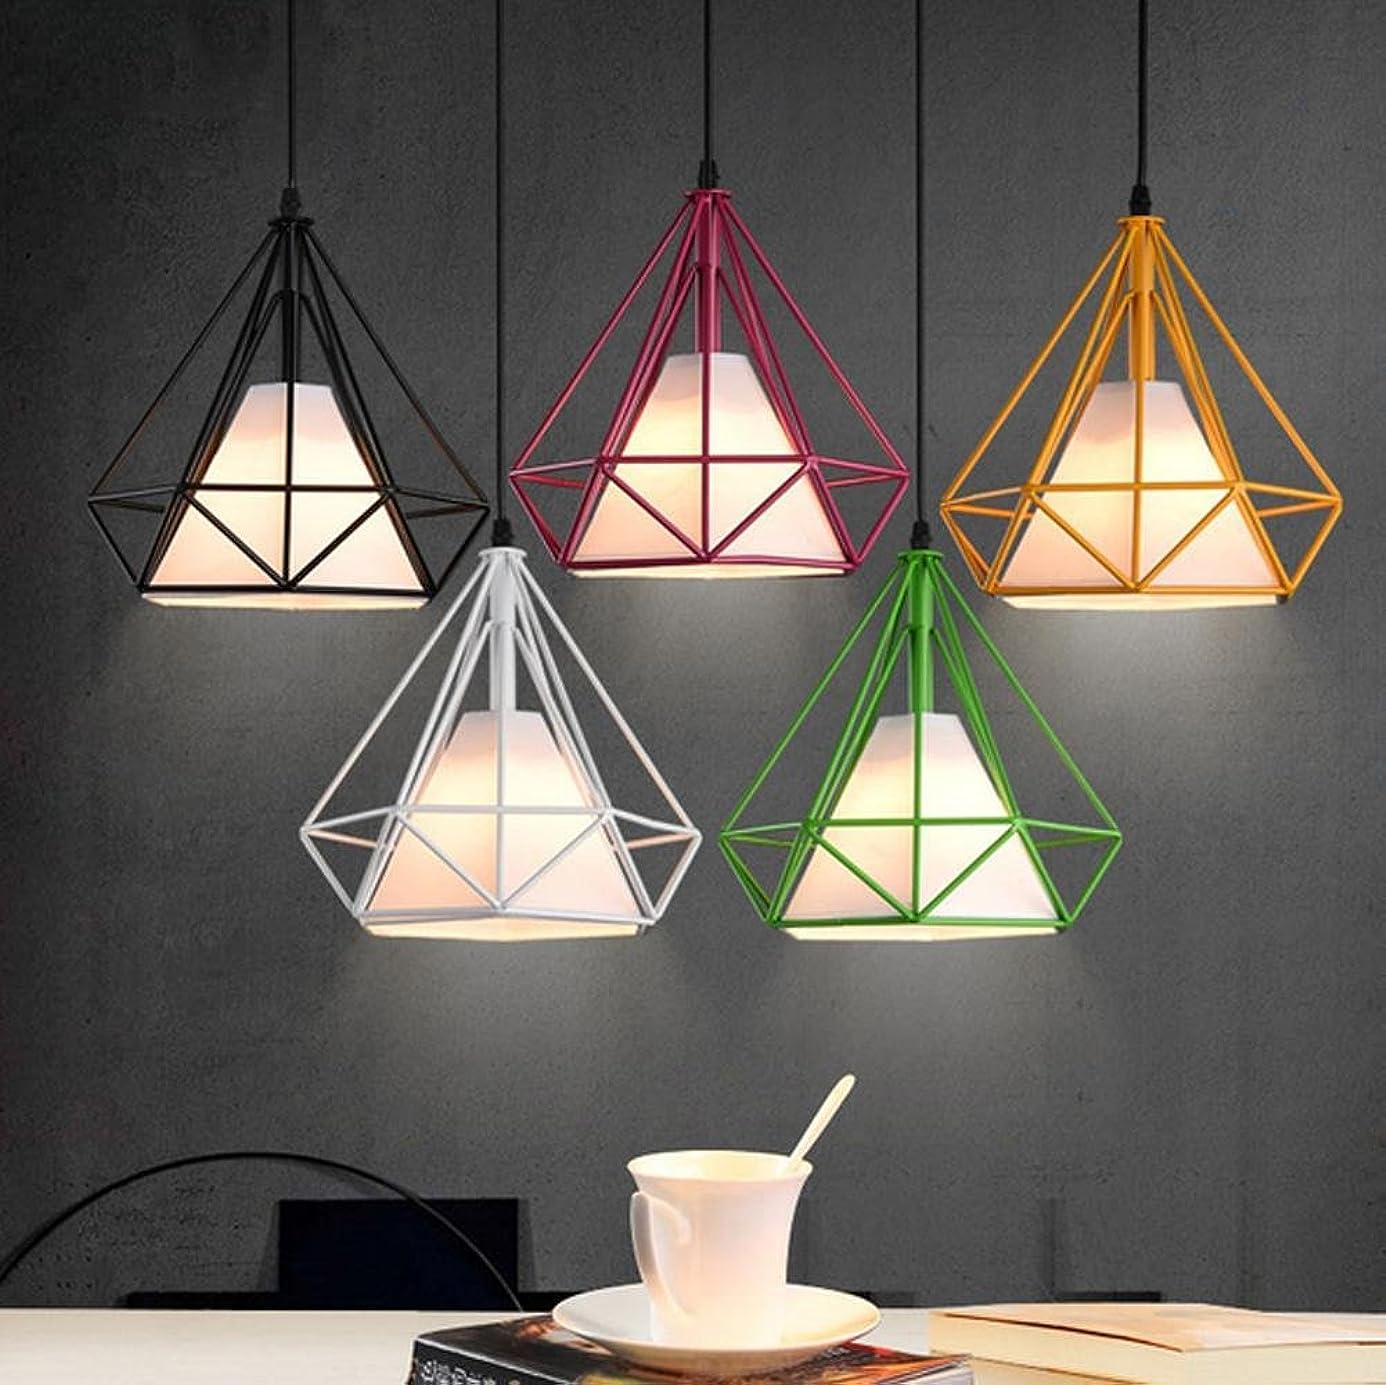 WWQY outdoors American Diamond Cage Pendant Lamp 25/38cm Nordic Wrought Iron Restaurant Industry Pendant Light, 38cm